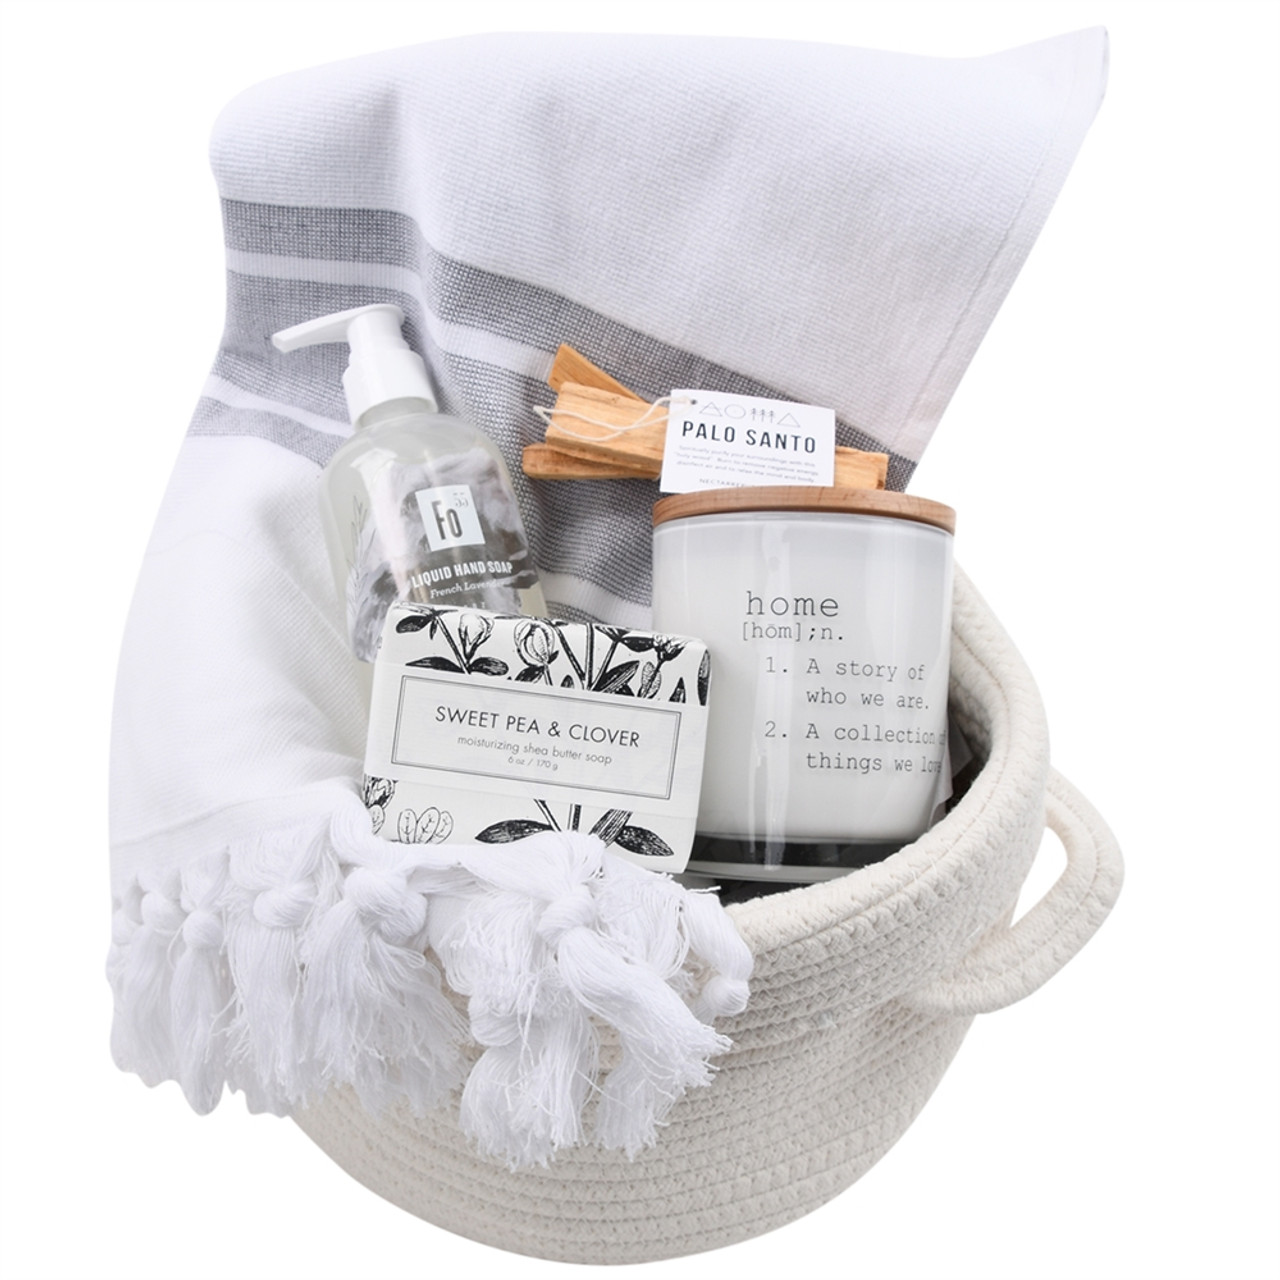 Housewarming Gift Basket - Home Sweet Home